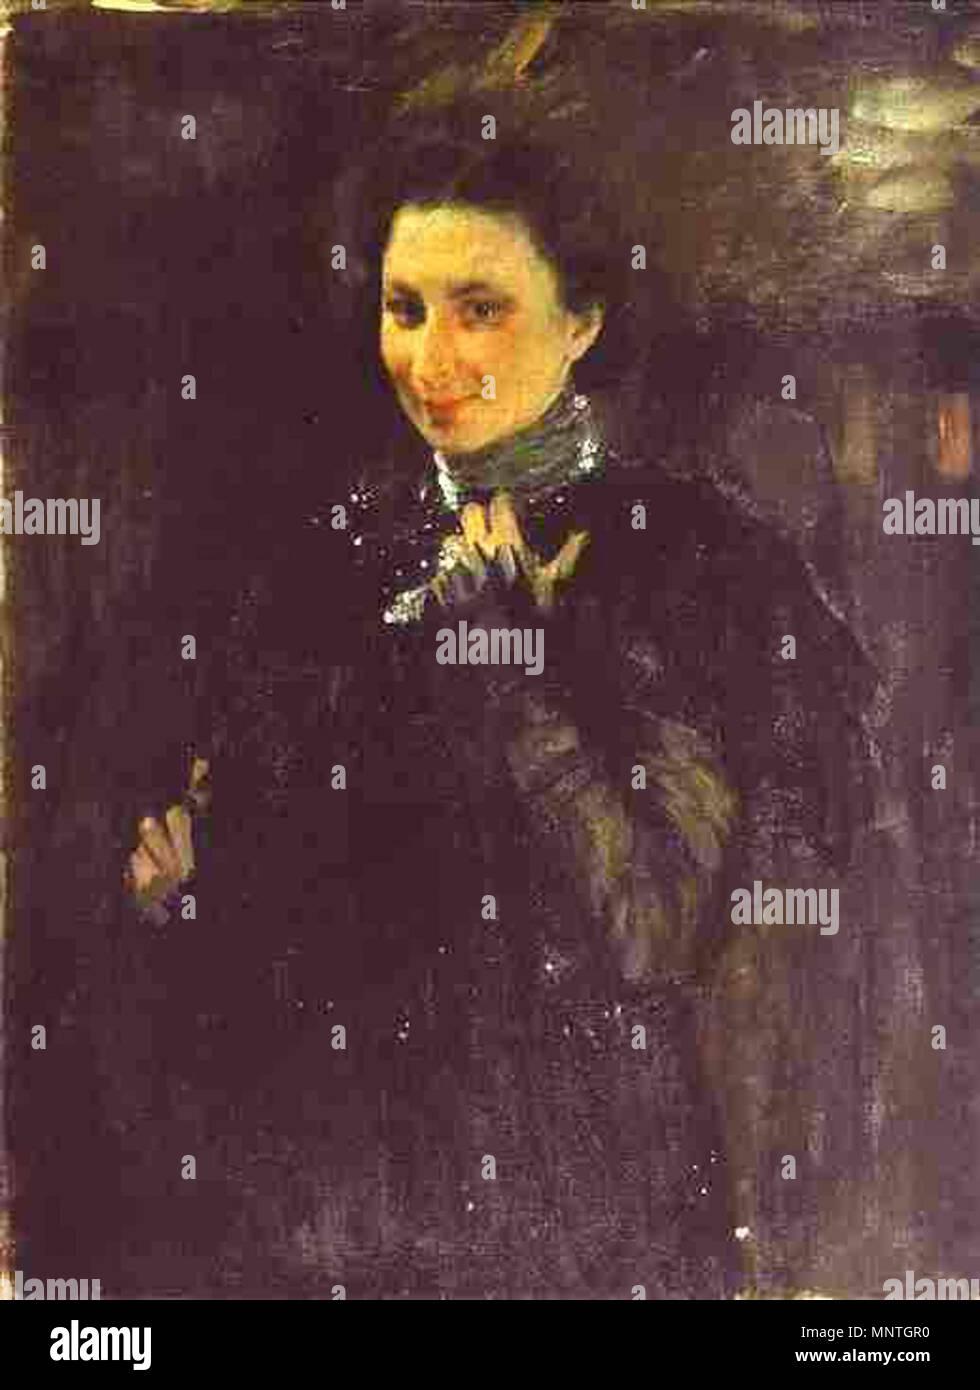 Valentin Serov, picture Peter 1: date and creation history, description 37